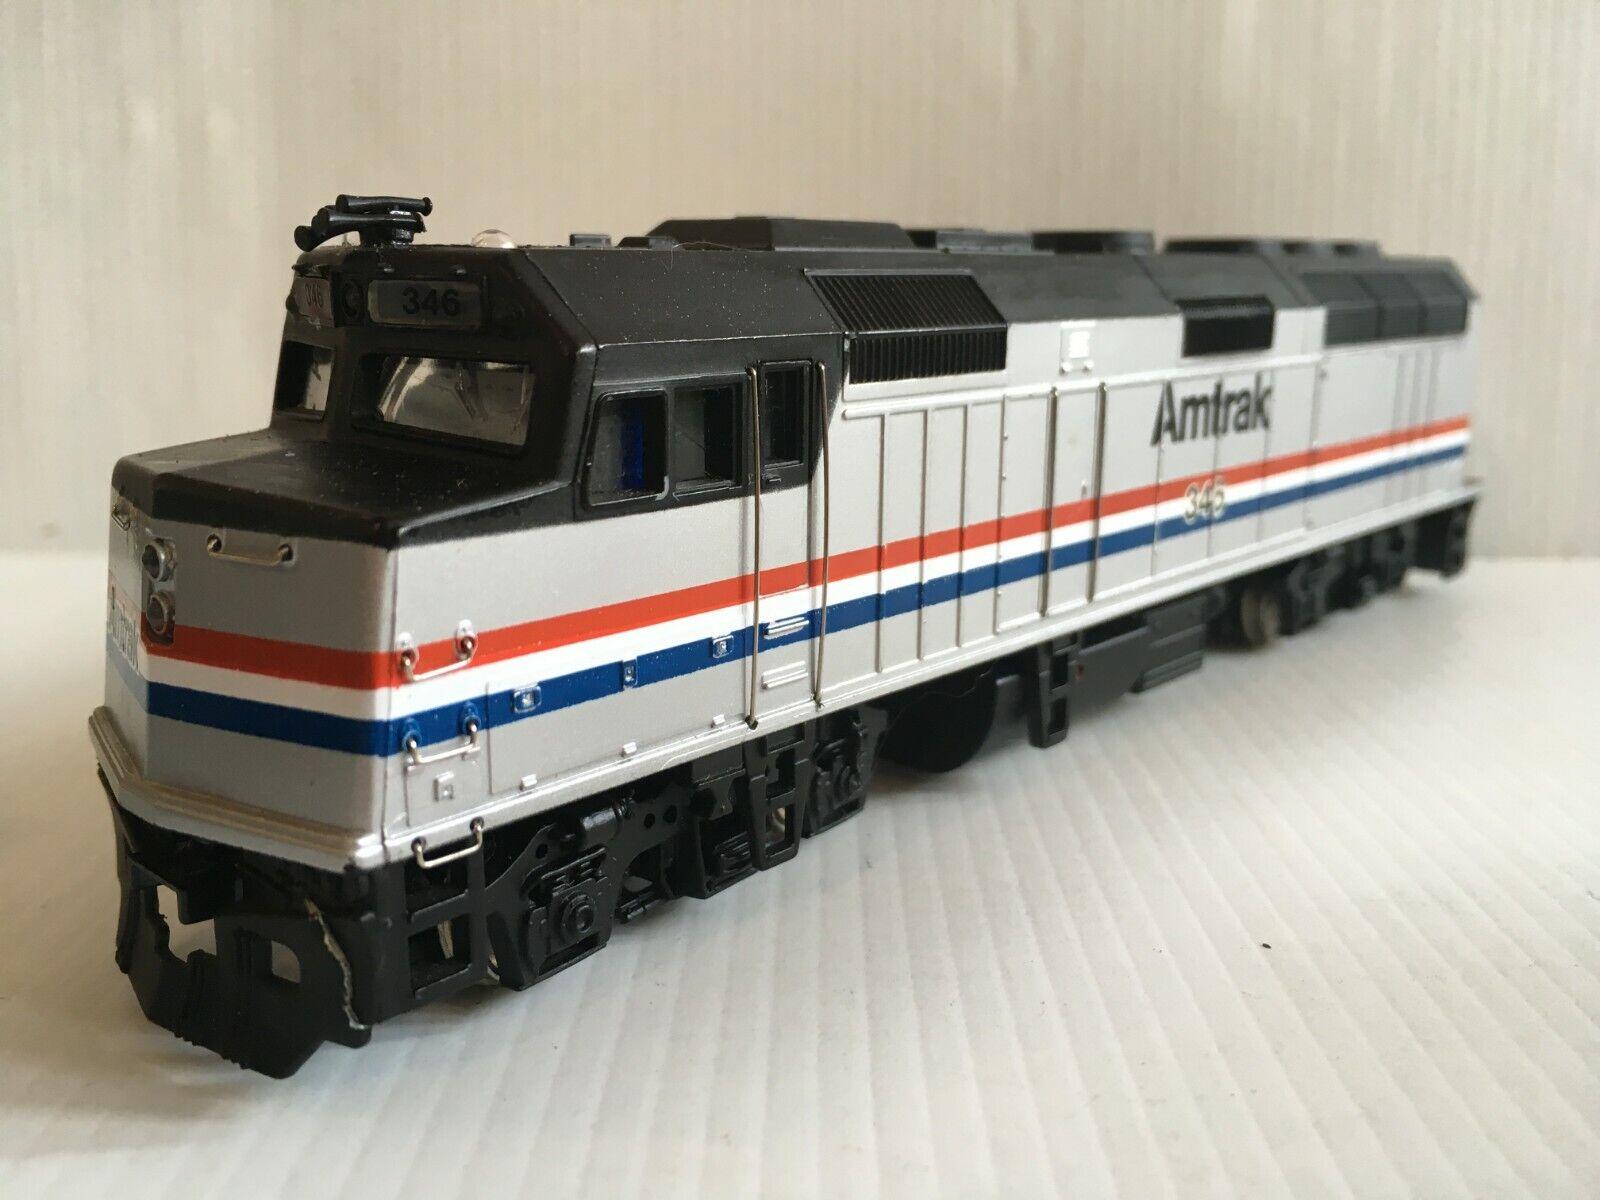 Spectrum 87006 Amtrak F40PH Diesel Loco Phase lll Good Condition scatolaed T48 Post